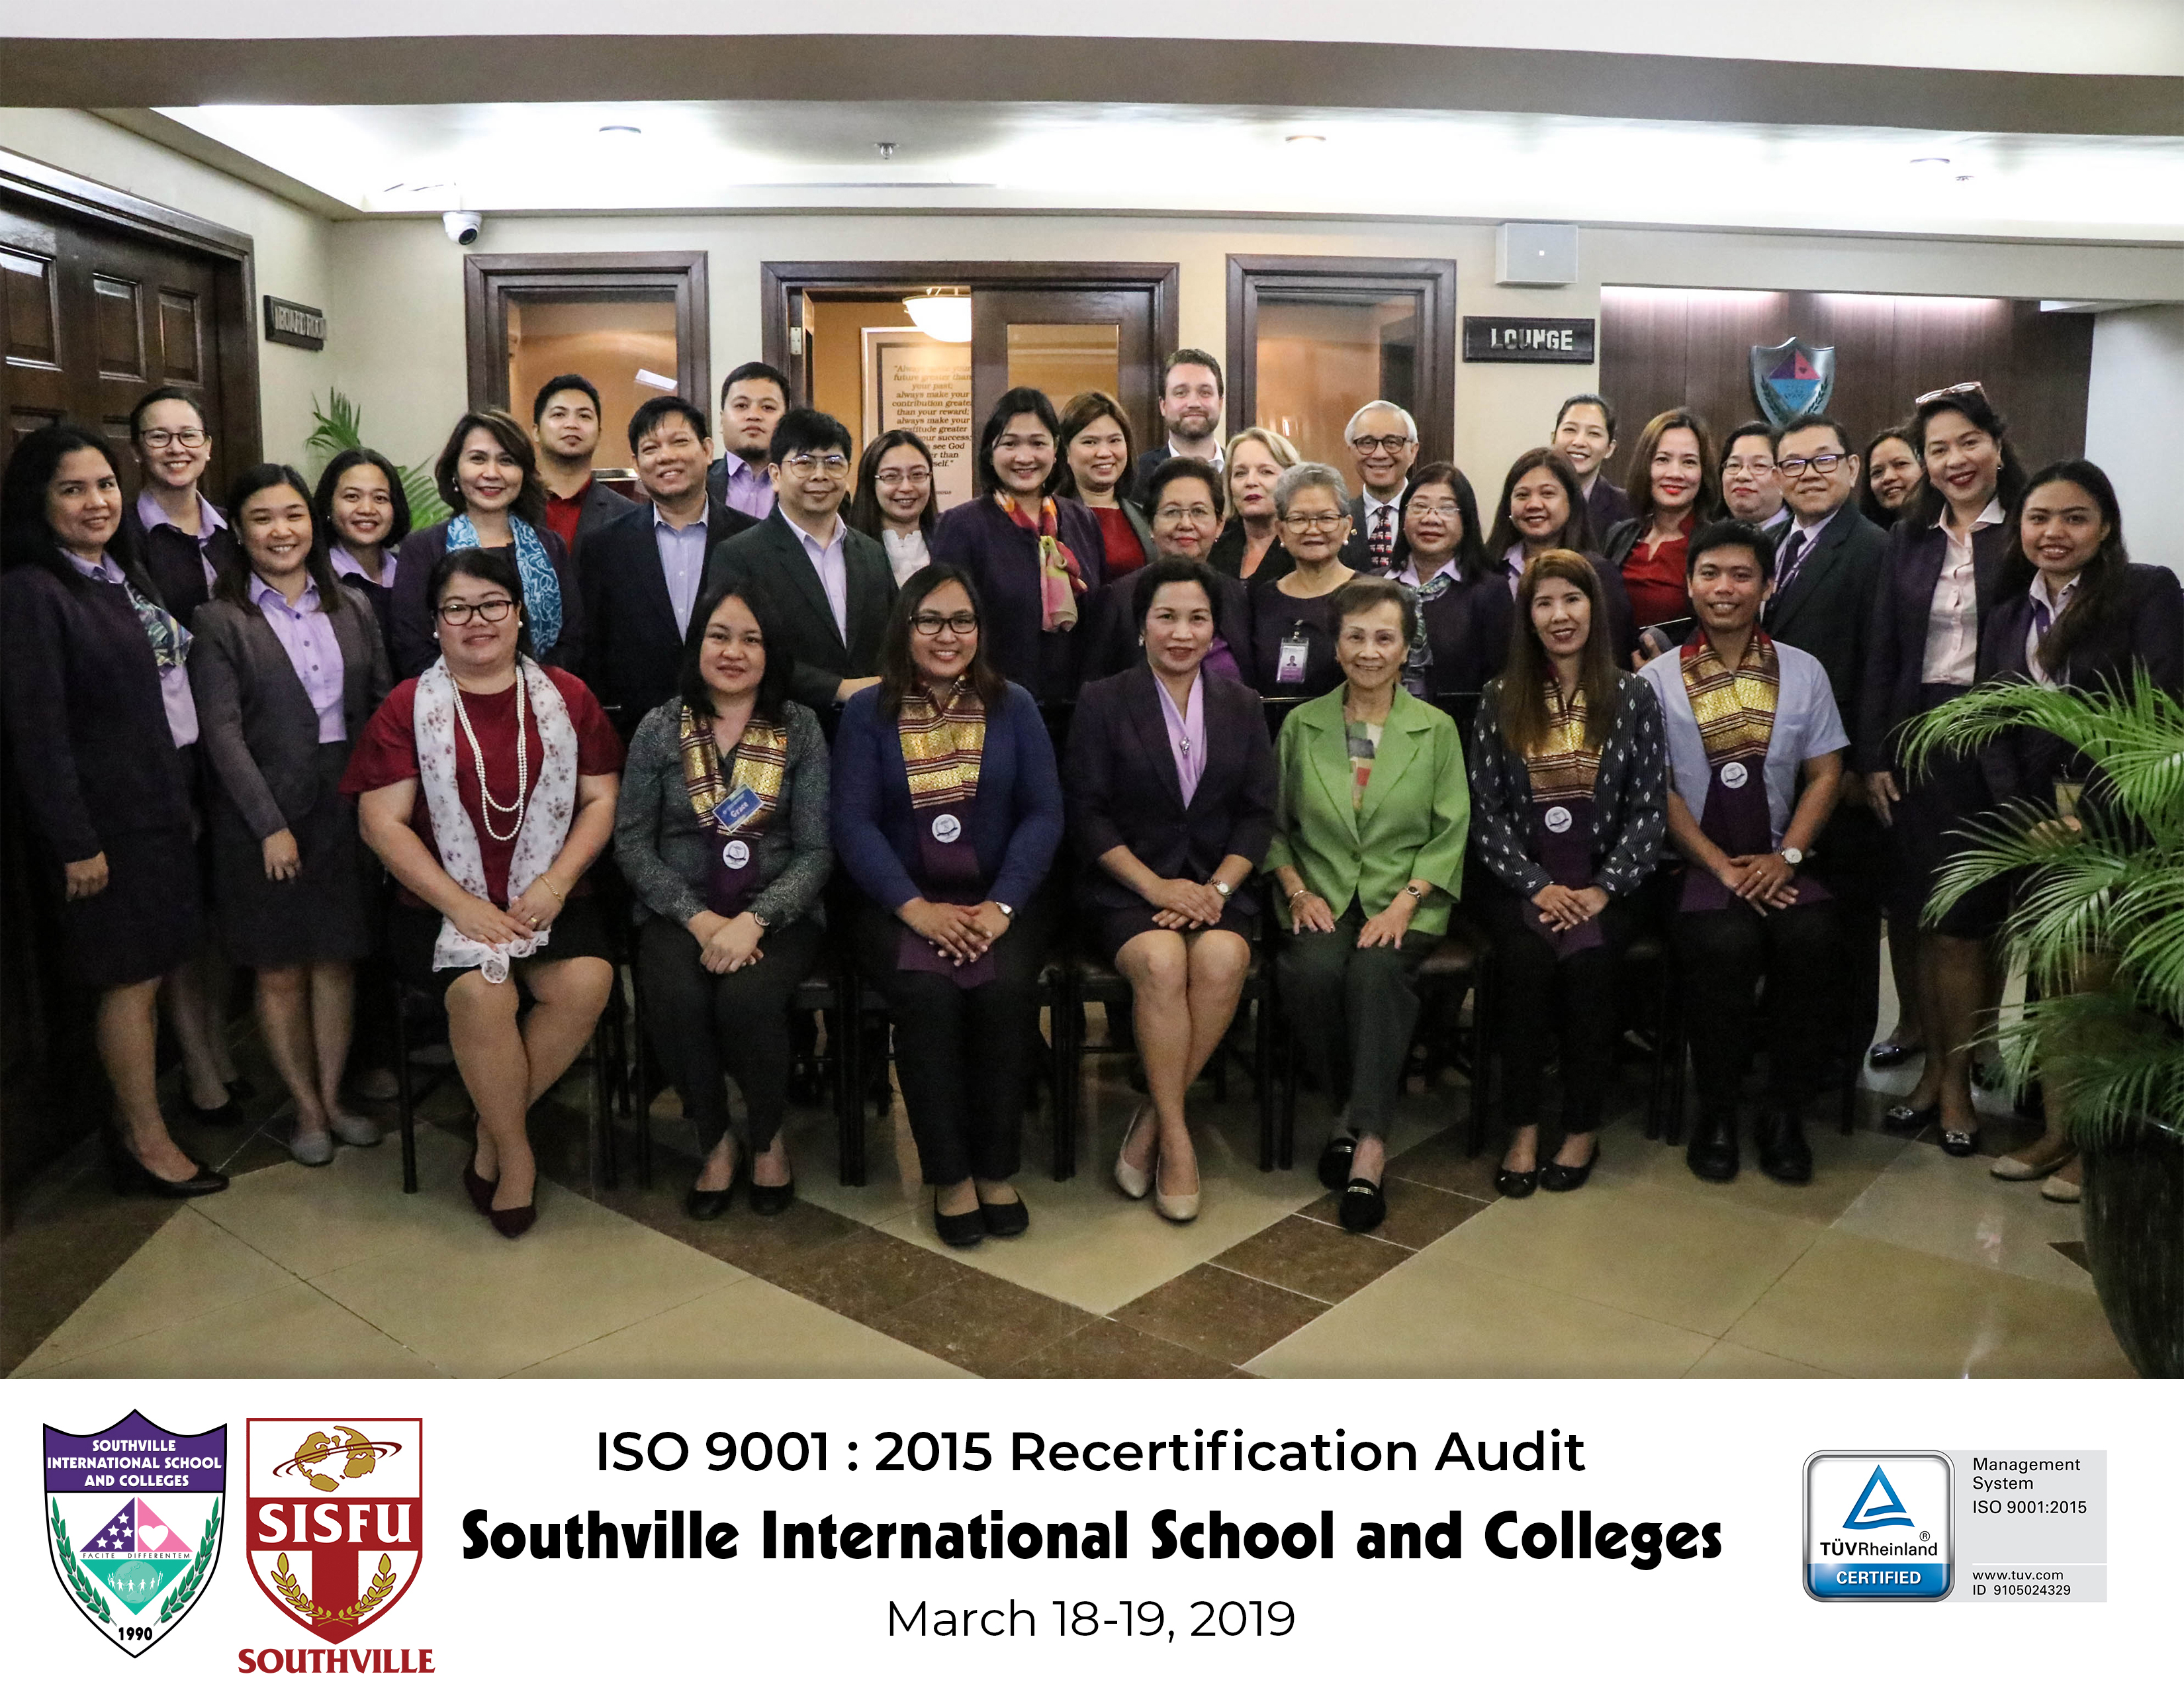 Southville Receives ISO 9001:2015 Accreditation, Zero Non-Conformity (NC) Status